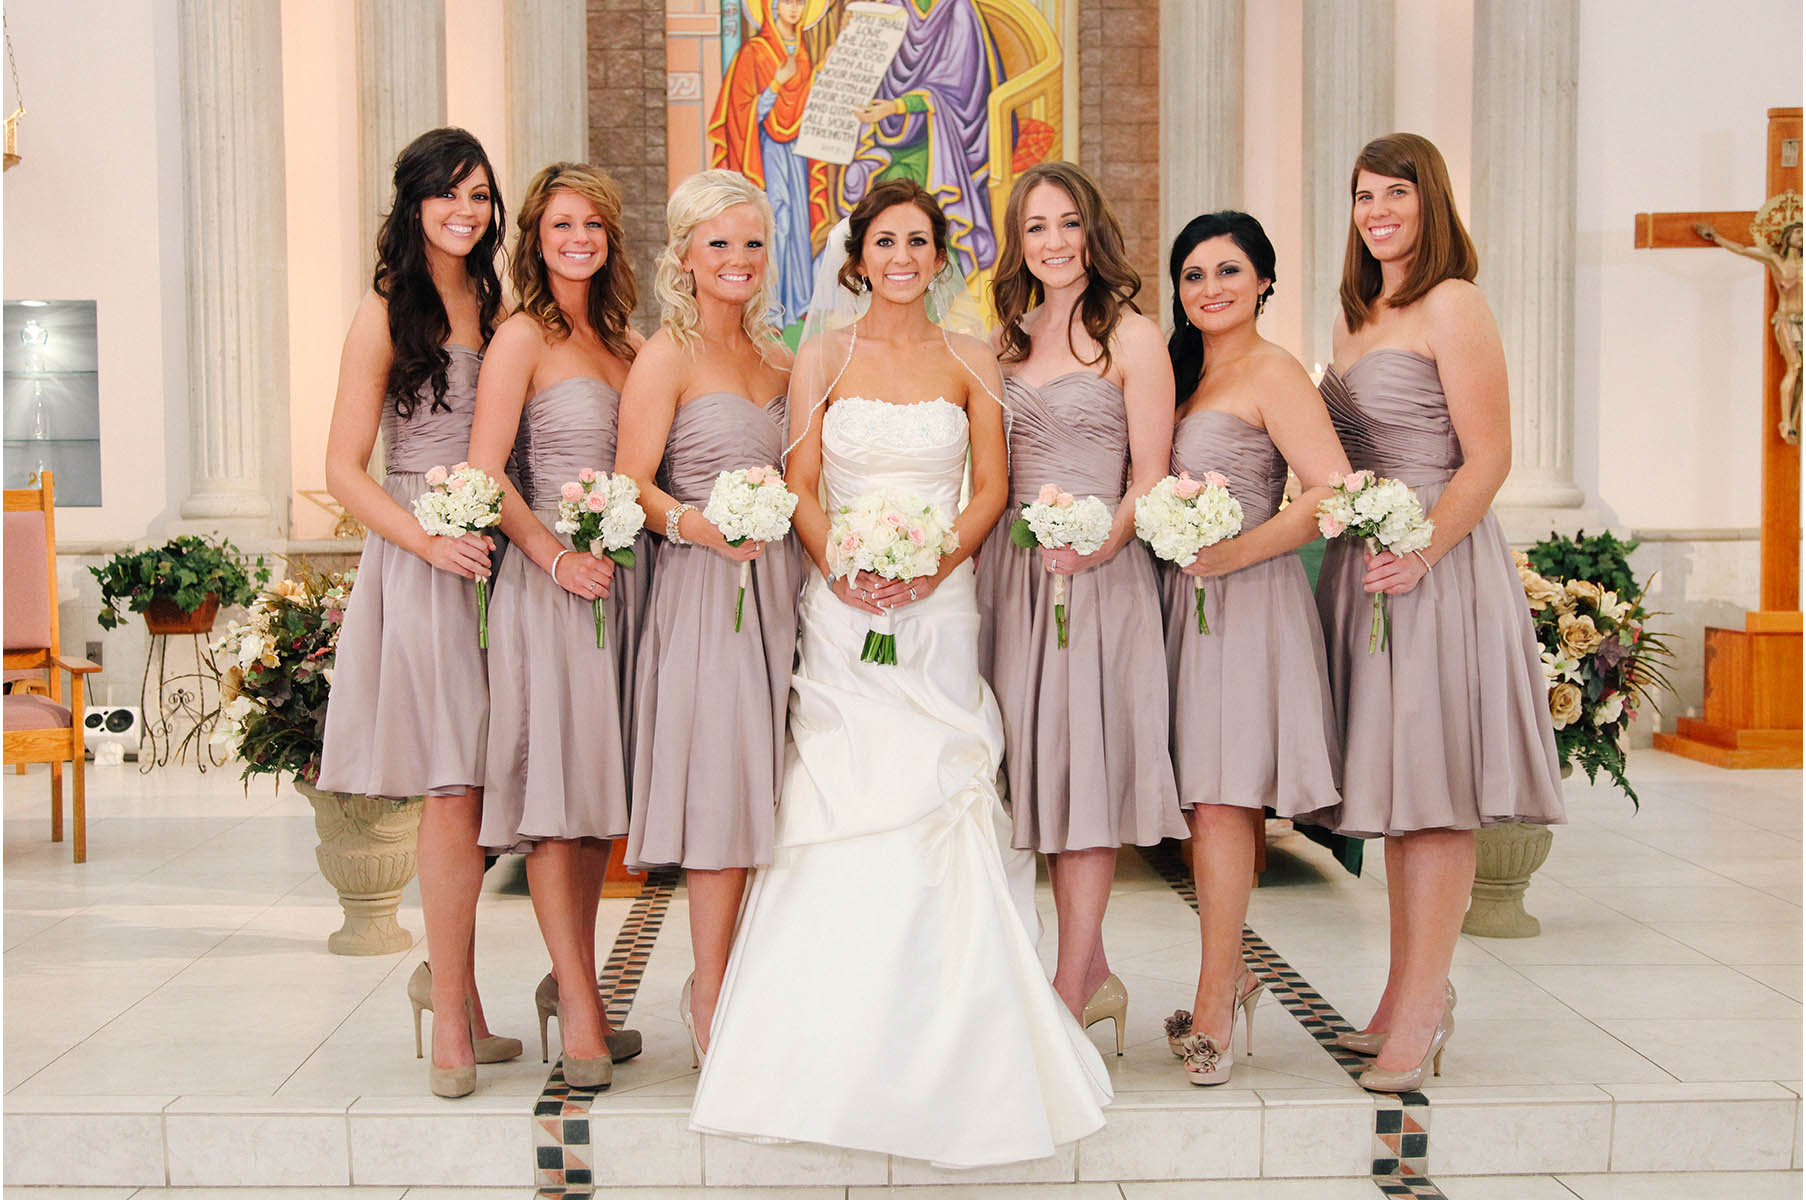 stannesstonebridgemanorwedding18